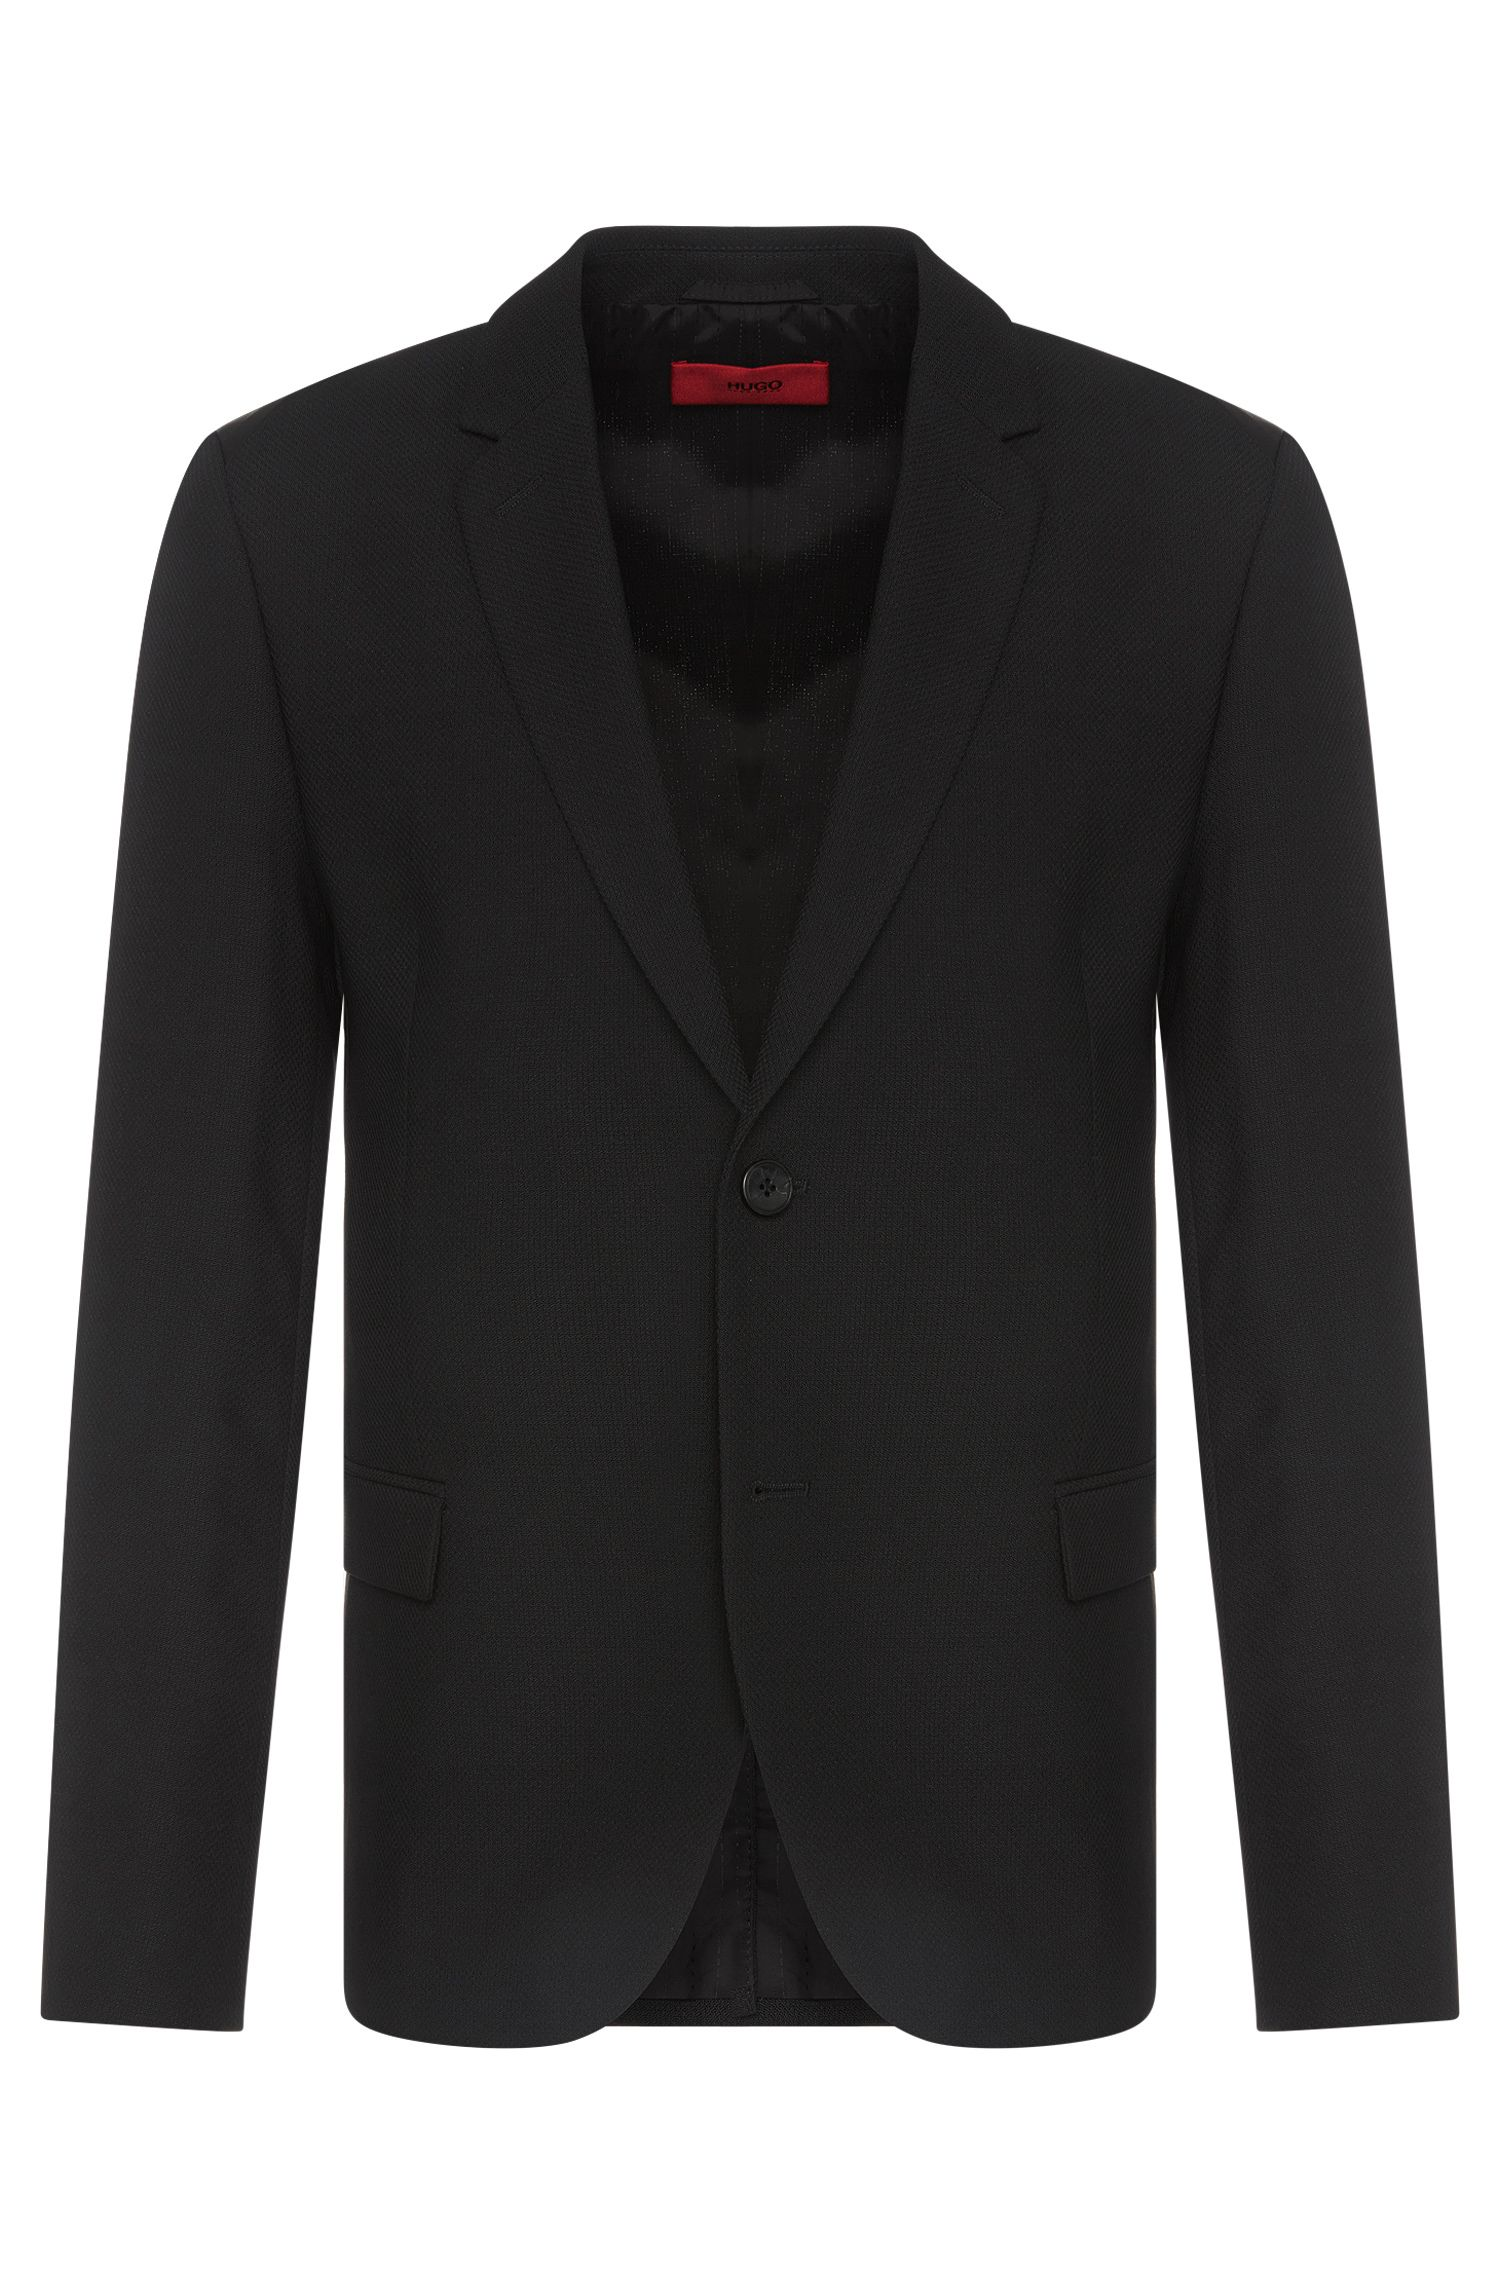 'Ander' | Regular Fit, Virgin Wool Blend Textured Sport Coat